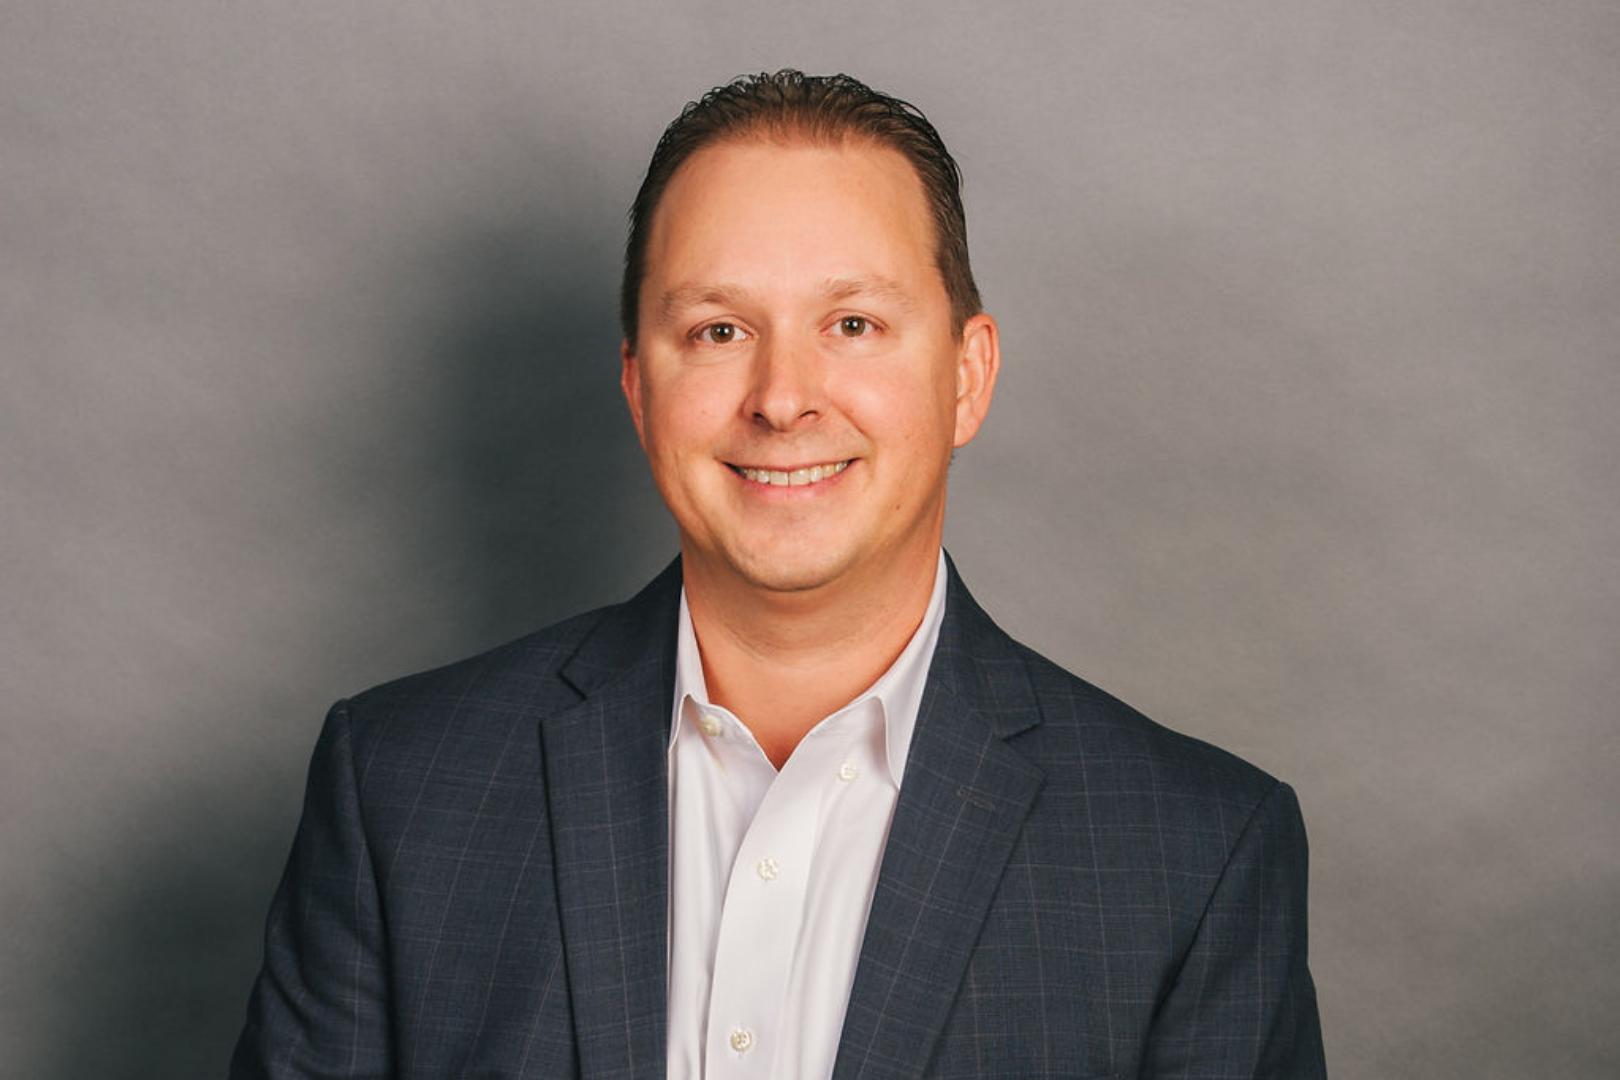 John Snyder - CEO